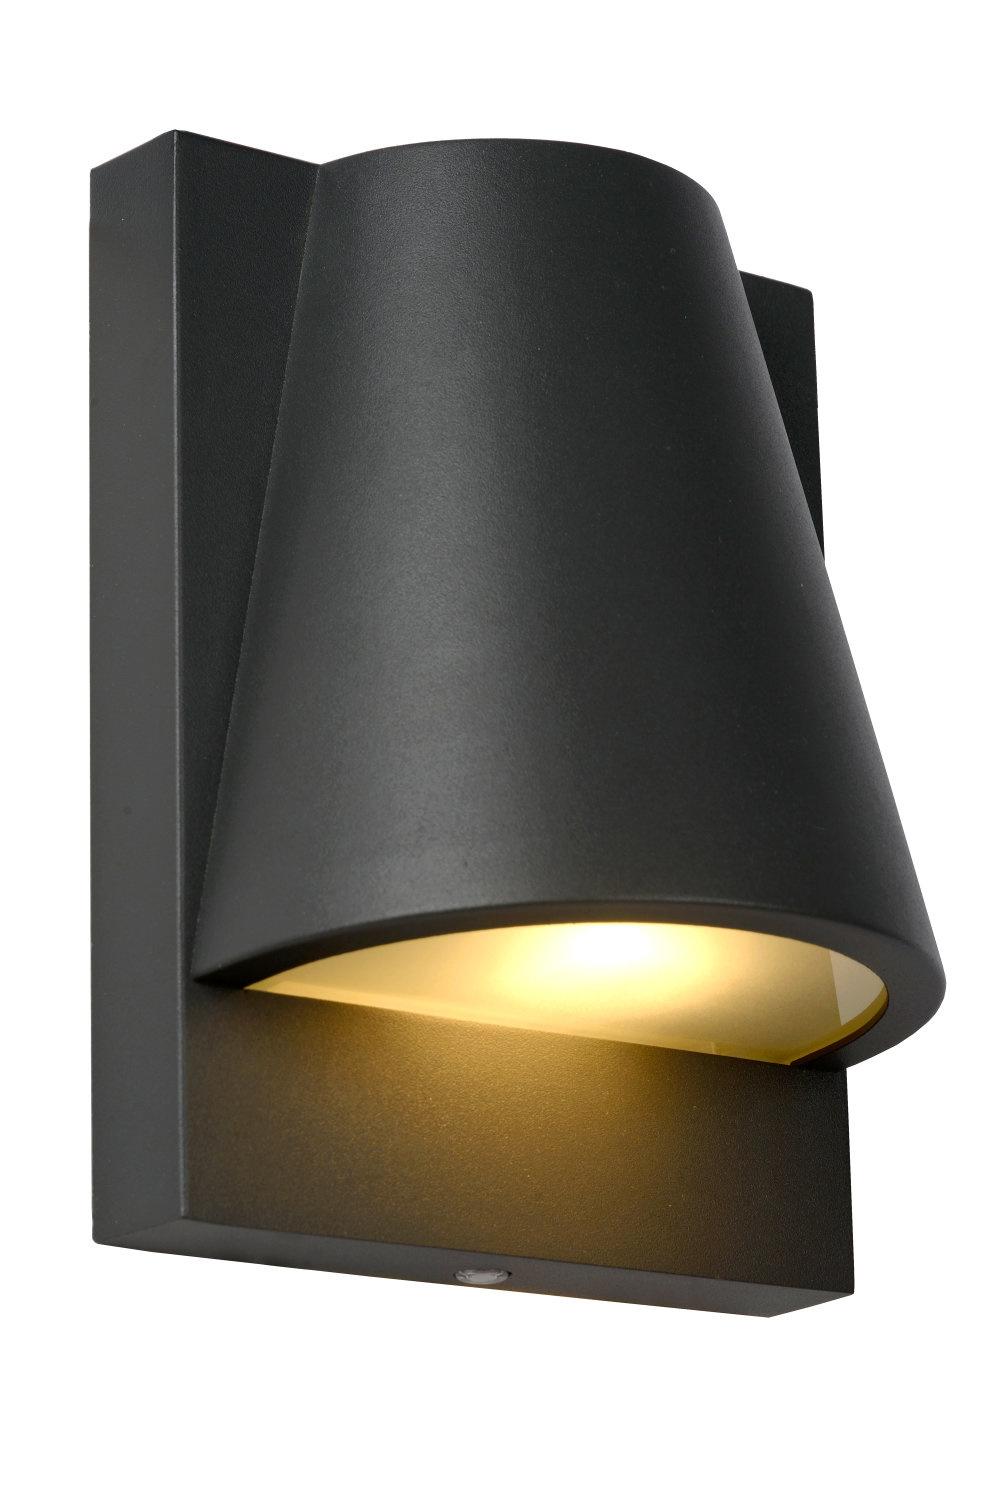 Lucide LIAM Wandlamp Buiten-Antrac.-1xGU10-35W-IP44